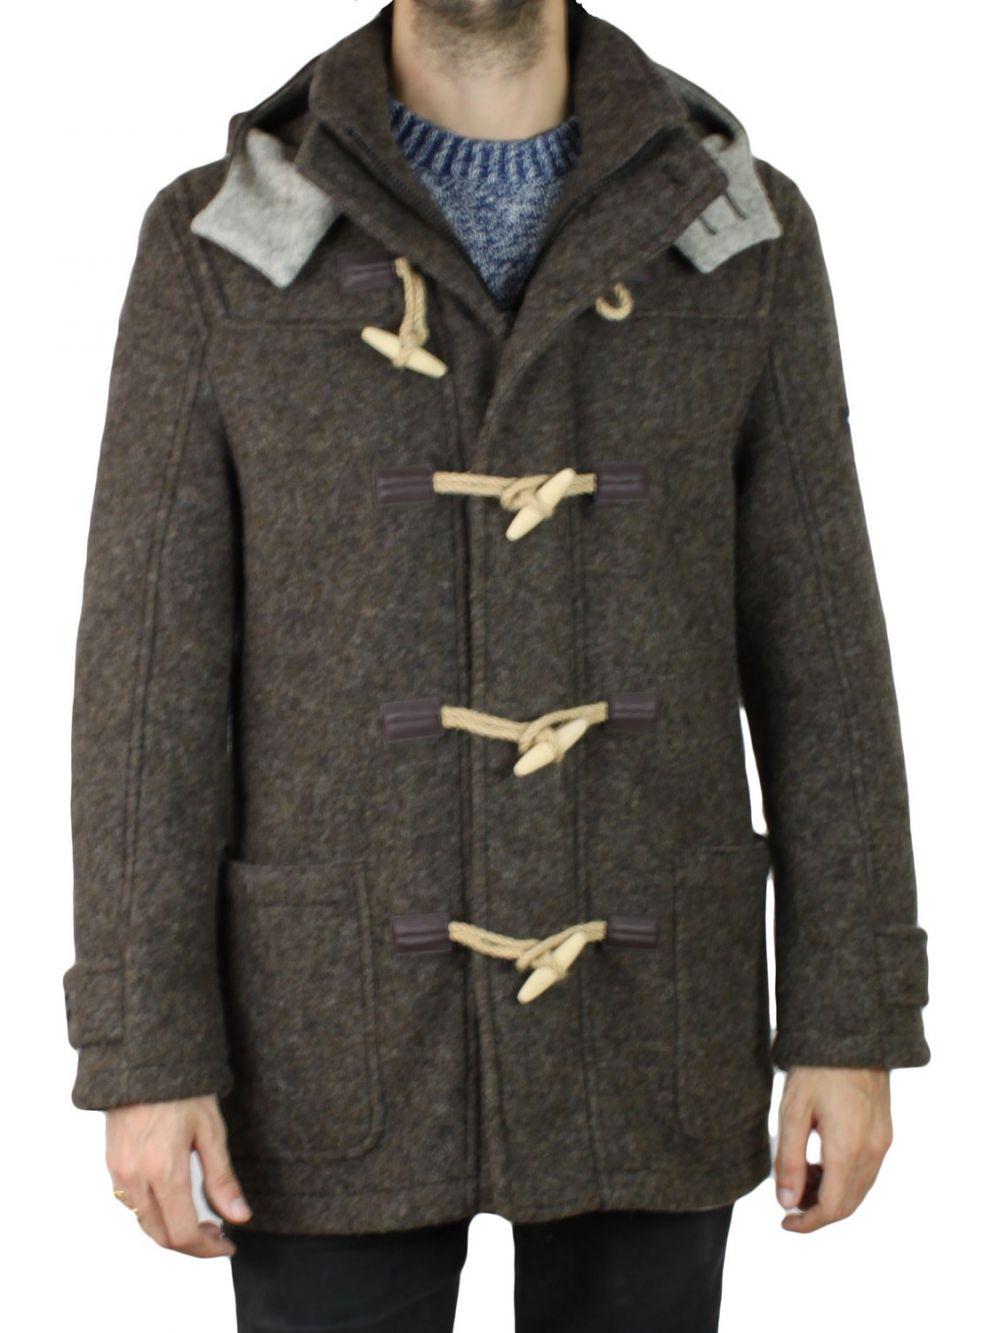 manteau duffle coat homme pierre cardin marron kebello com. Black Bedroom Furniture Sets. Home Design Ideas